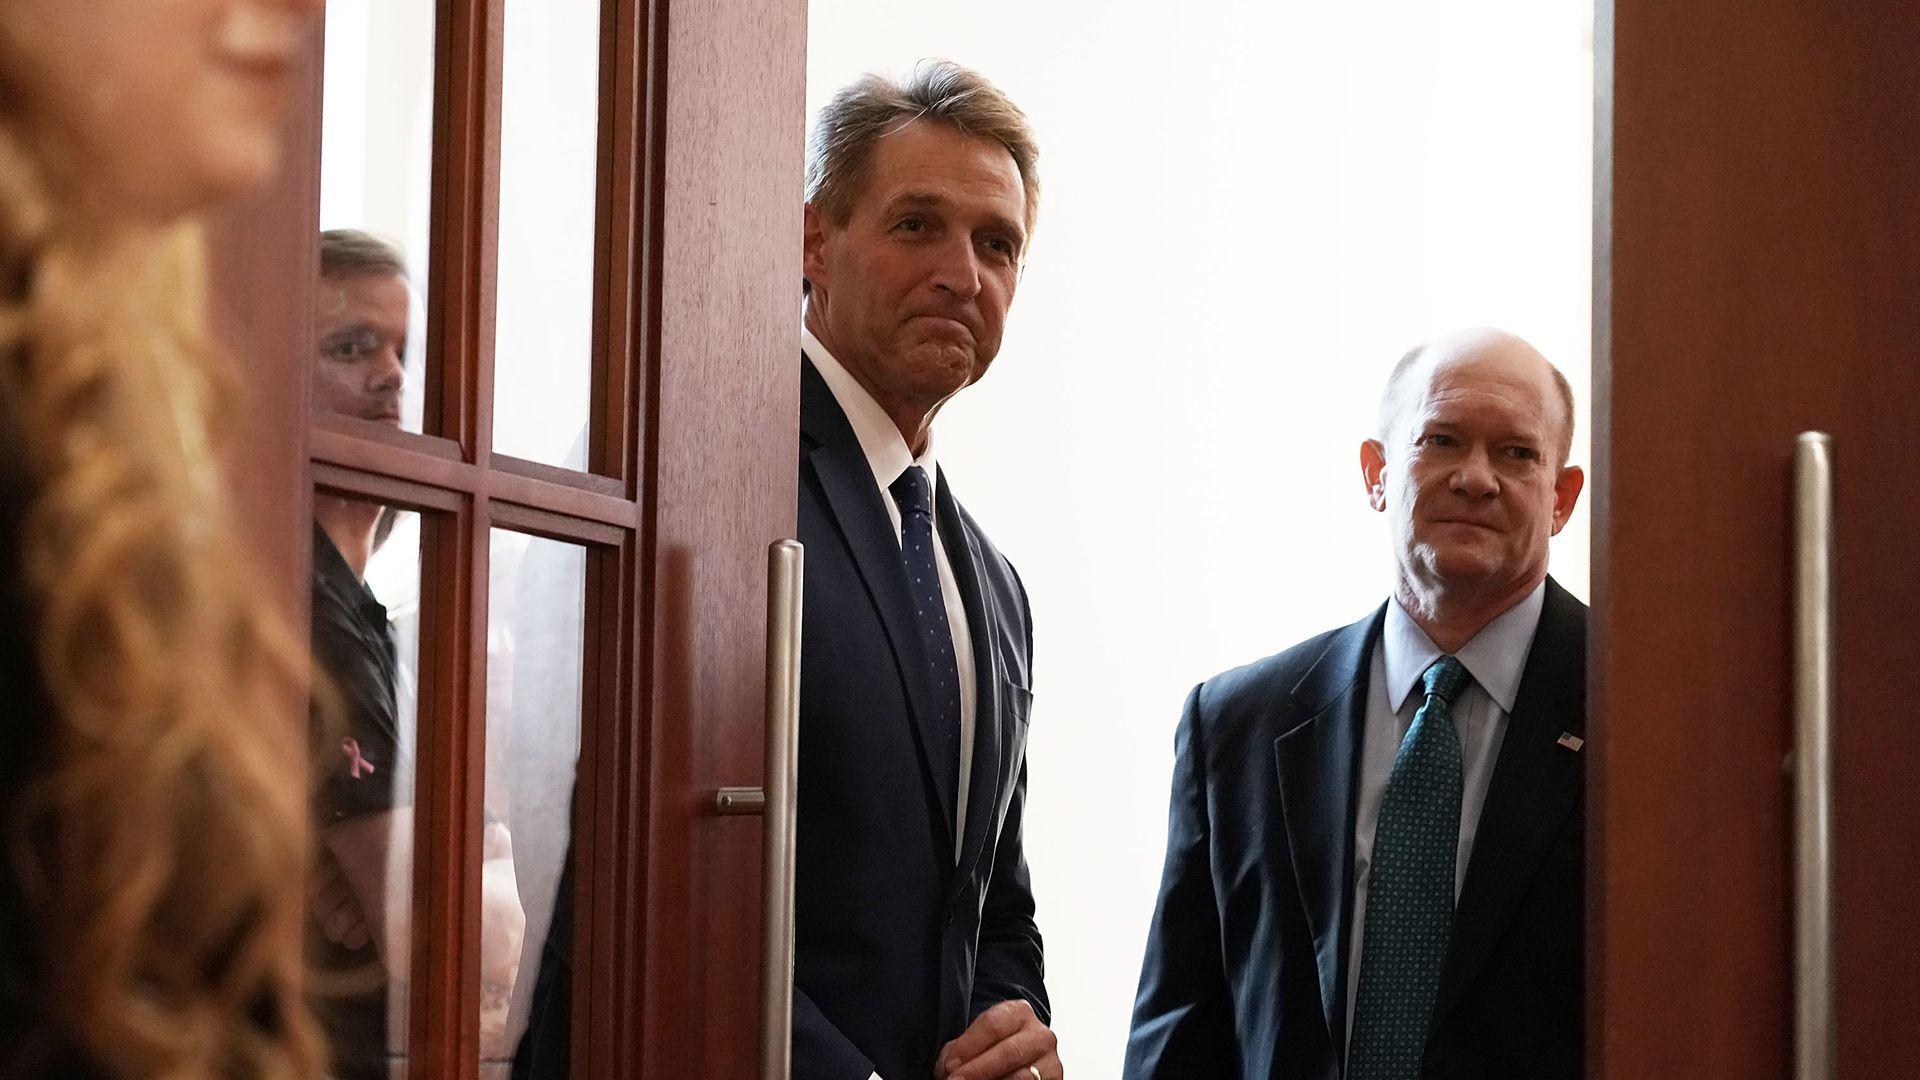 Senators Jeff Flake and Chris Coons